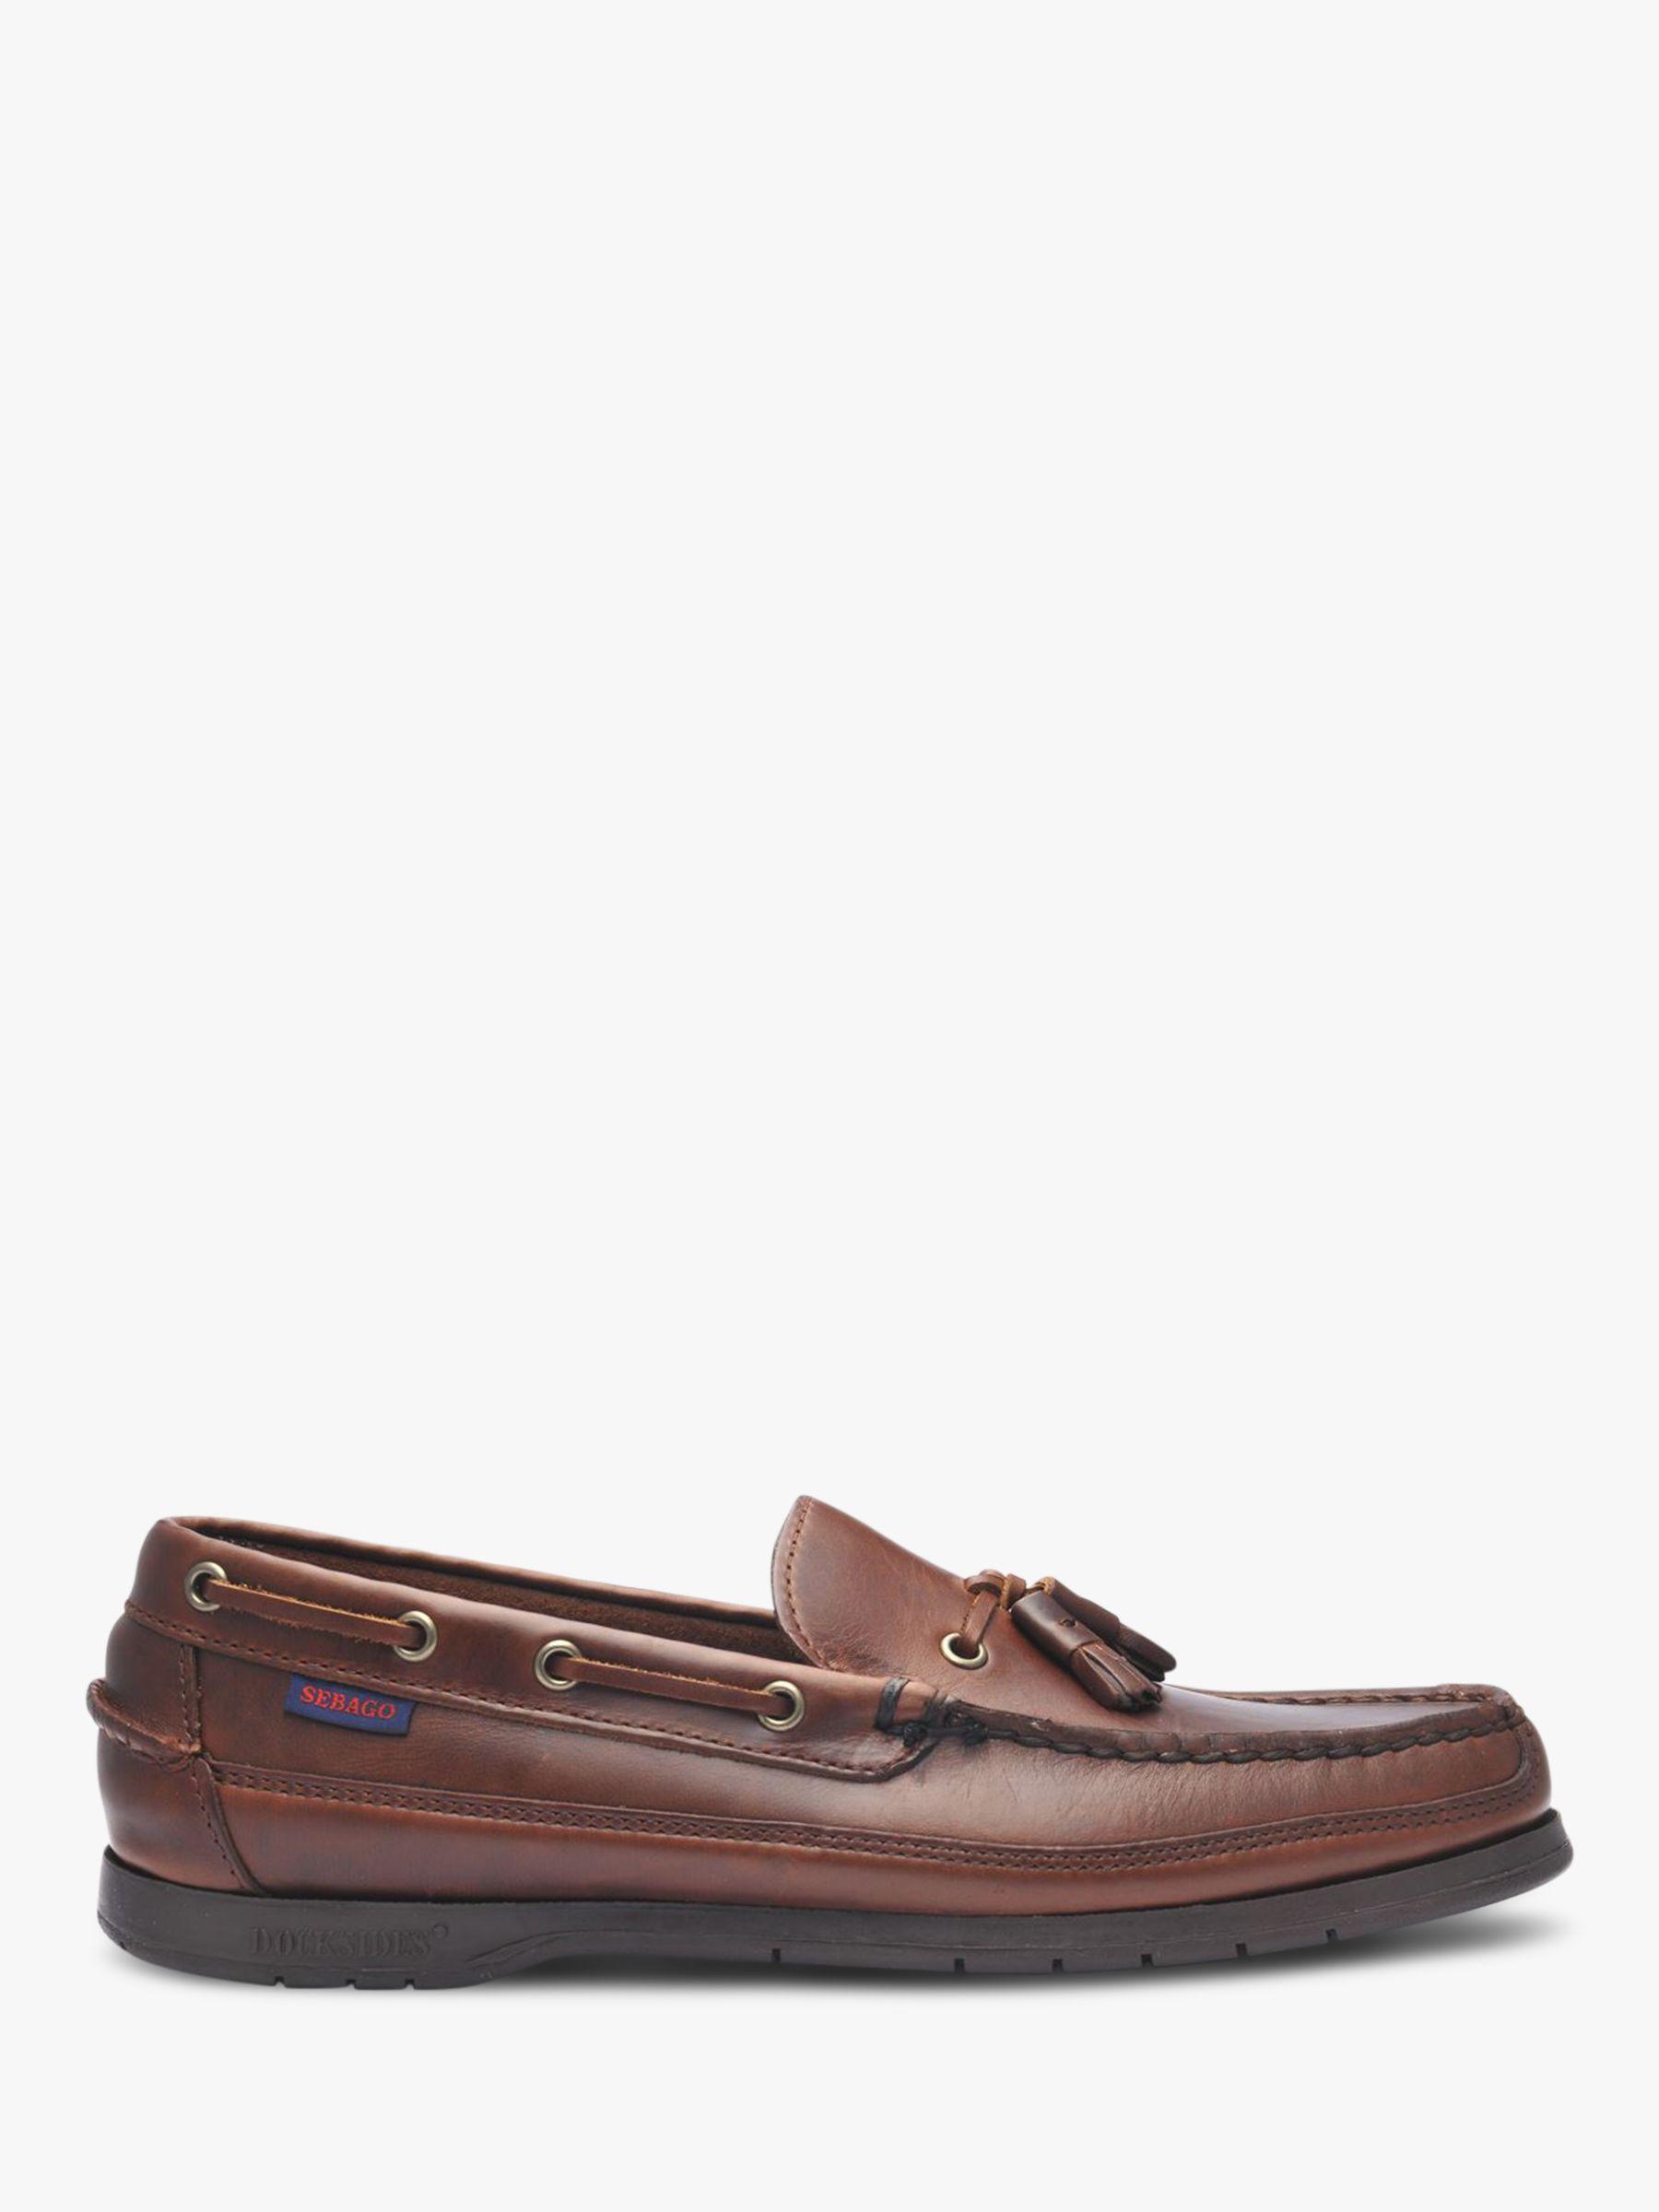 Sebago Sebago Ketch Leather Boat Shoes, Brown